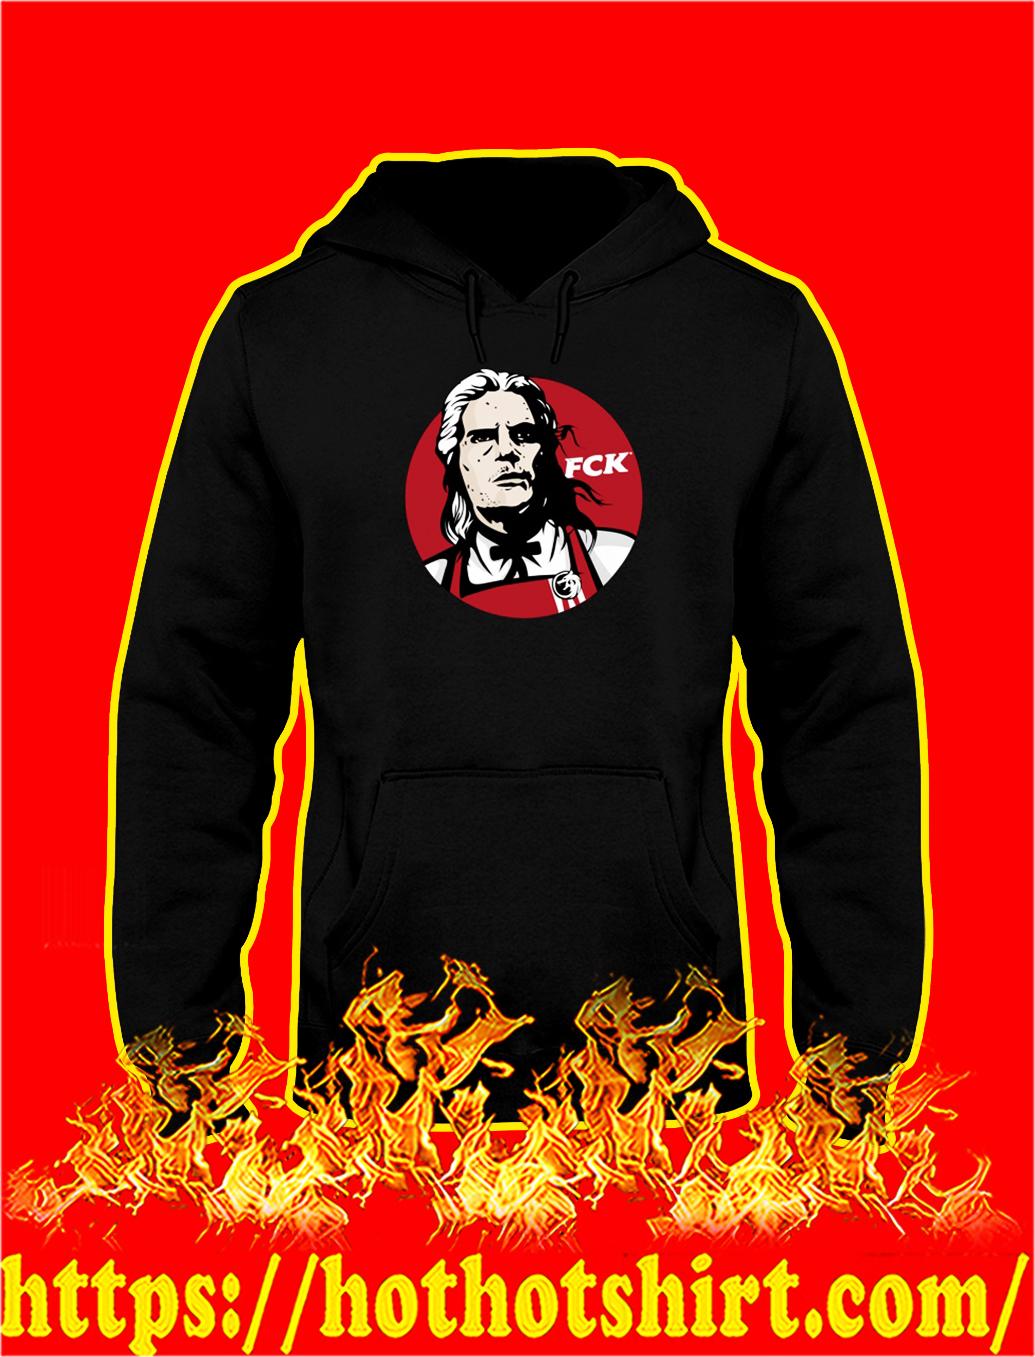 Witcher memes fck kfc hoodie